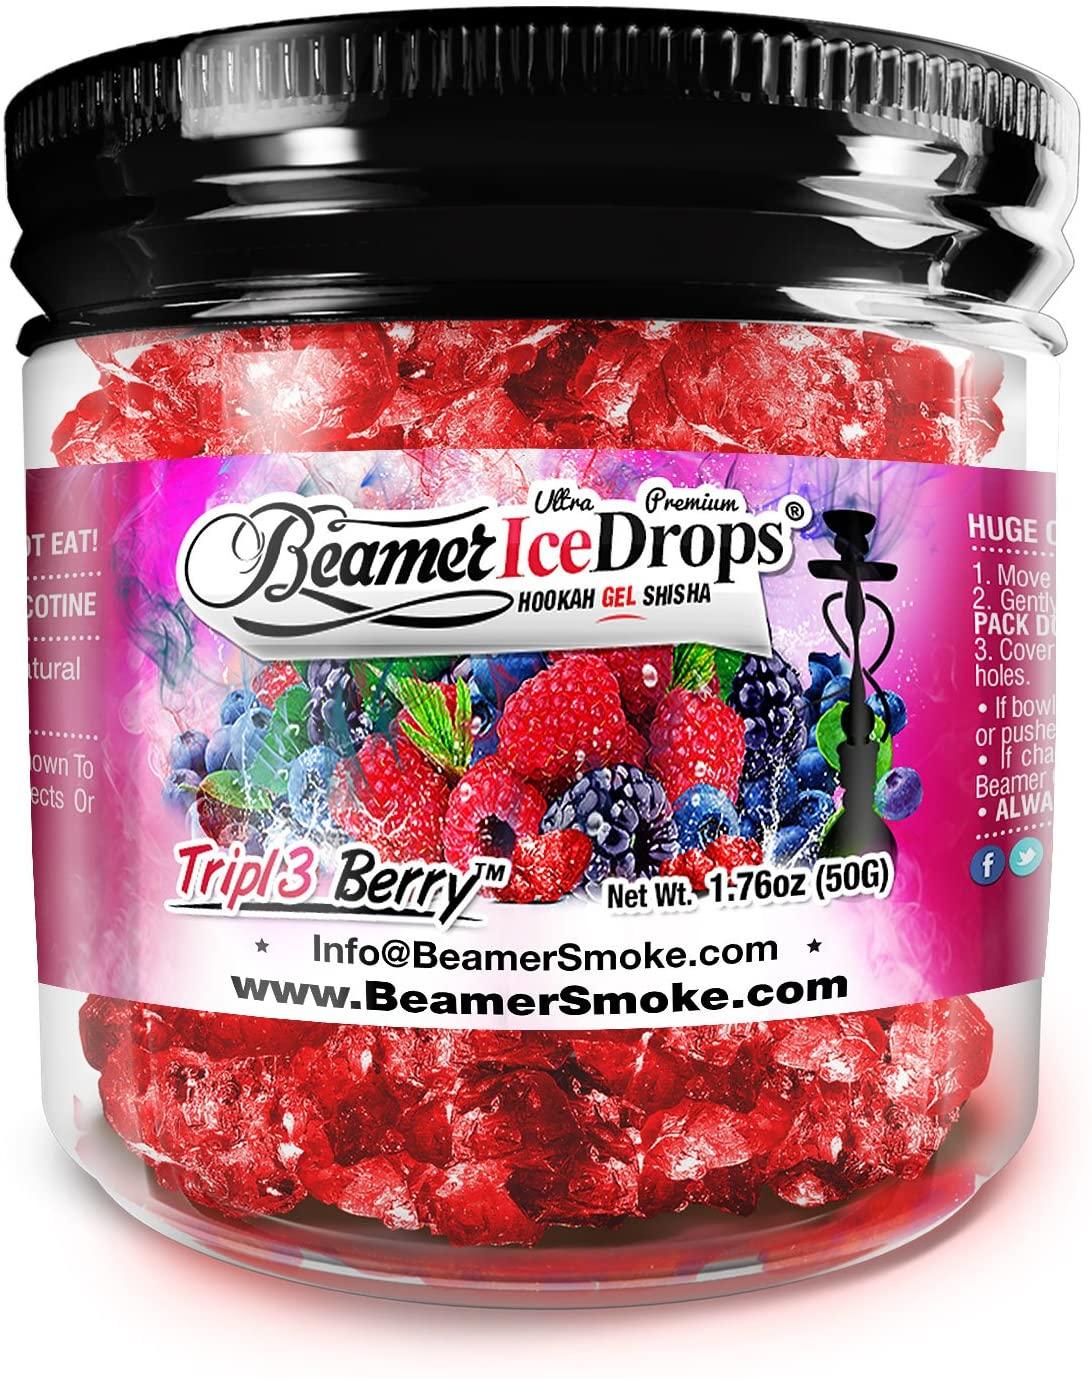 Triple Berry 50G Ultra Premium Beamer Ice Drops ¨ Hookah Shisha Smoking Gel. Each bowl lasts 2-4 Hours! USA Made, Huge Clouds, Amazing Taste! Better Taste & Clouds than Tobacco! 2-3 bowls per Jar!